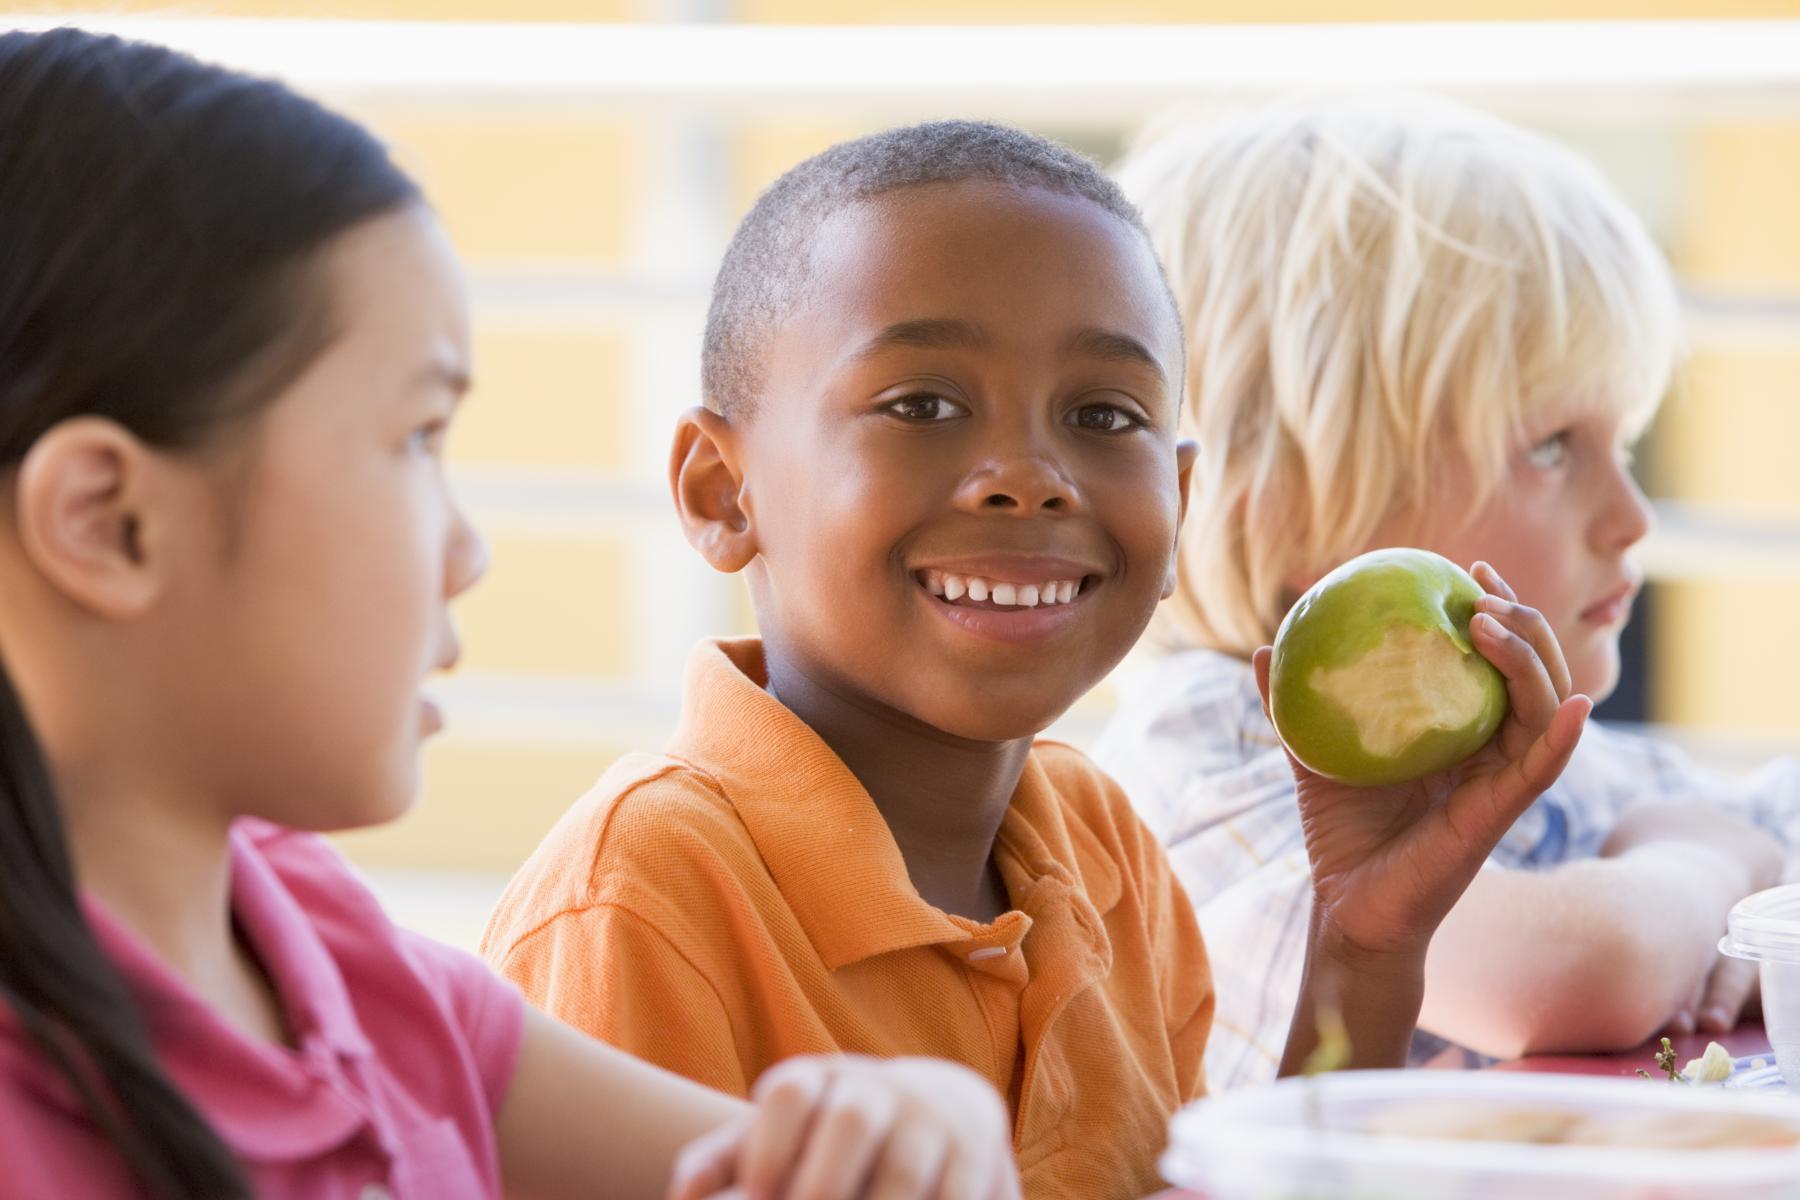 photodune-313996-kindergarten-children-eating-lunch-xl.jpg